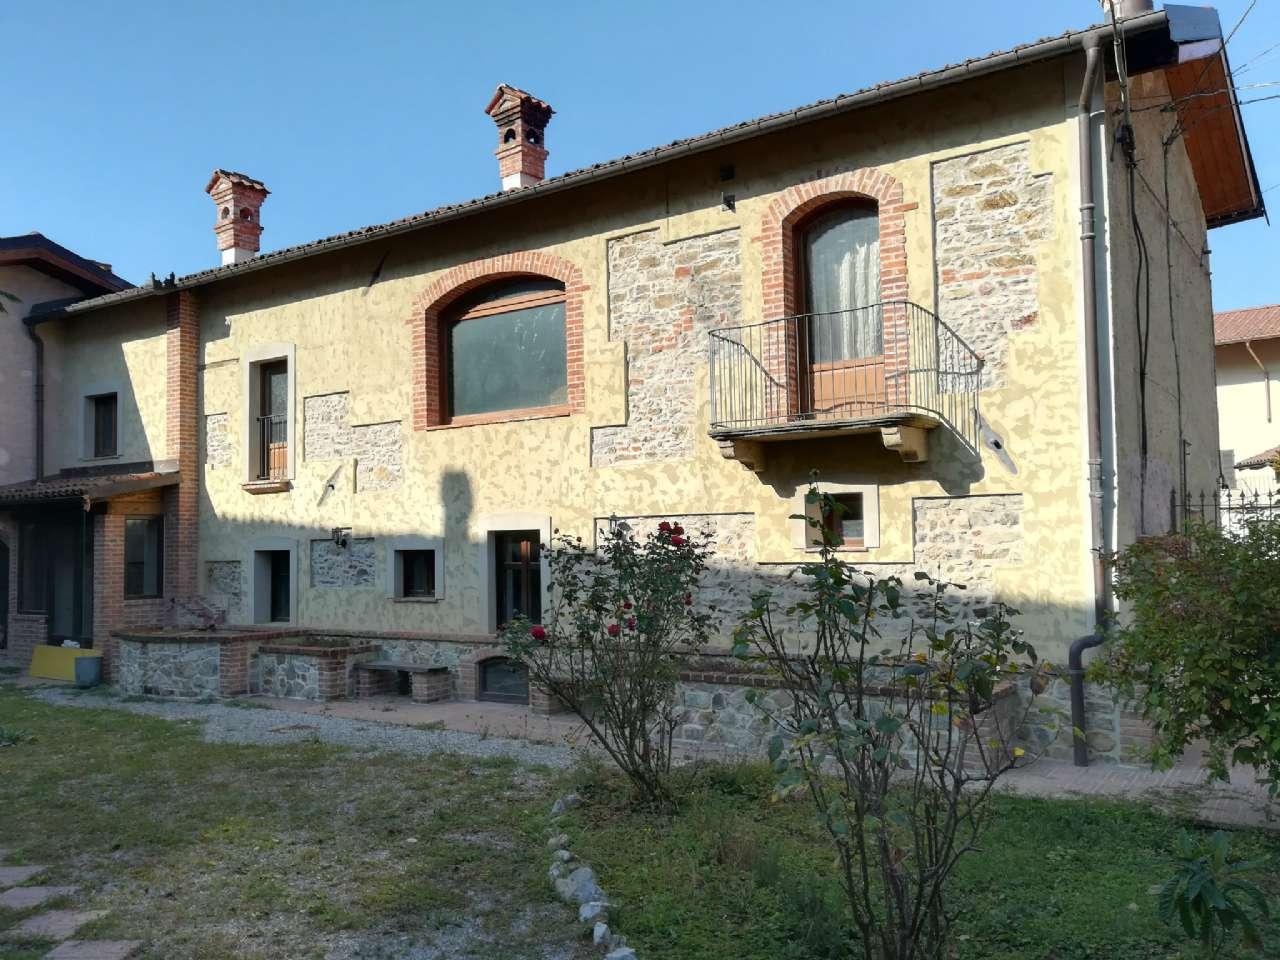 Foto 1 di Casa indipendente Via Piazza, Torre Mondovì